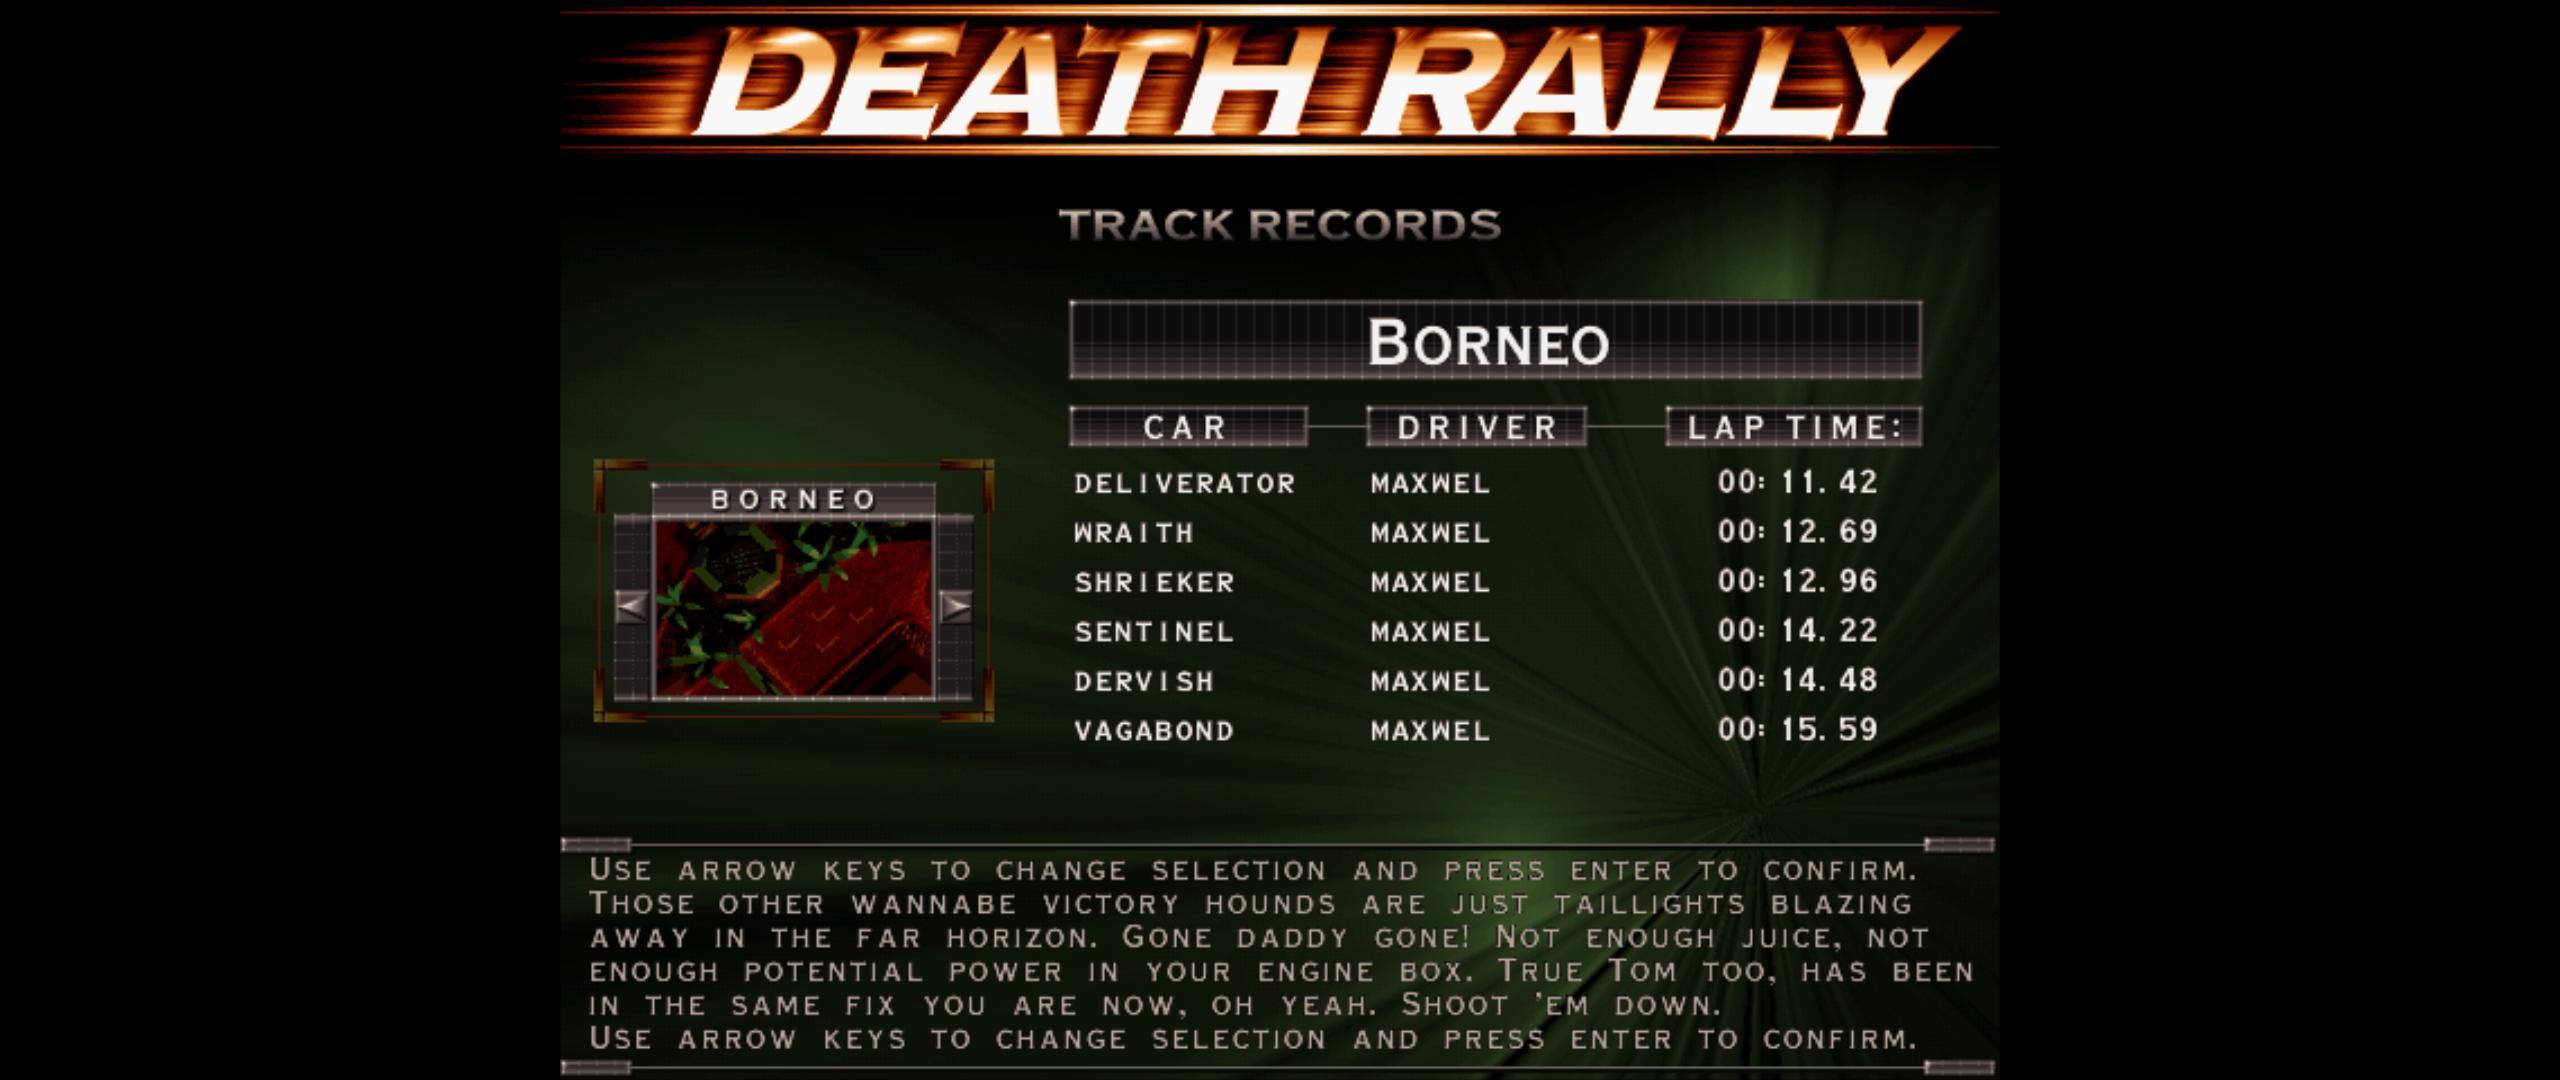 Maxwel: Death Rally [Borneo, Dervish Car Car] (PC) 0:00:14.48 points on 2016-03-04 07:54:02